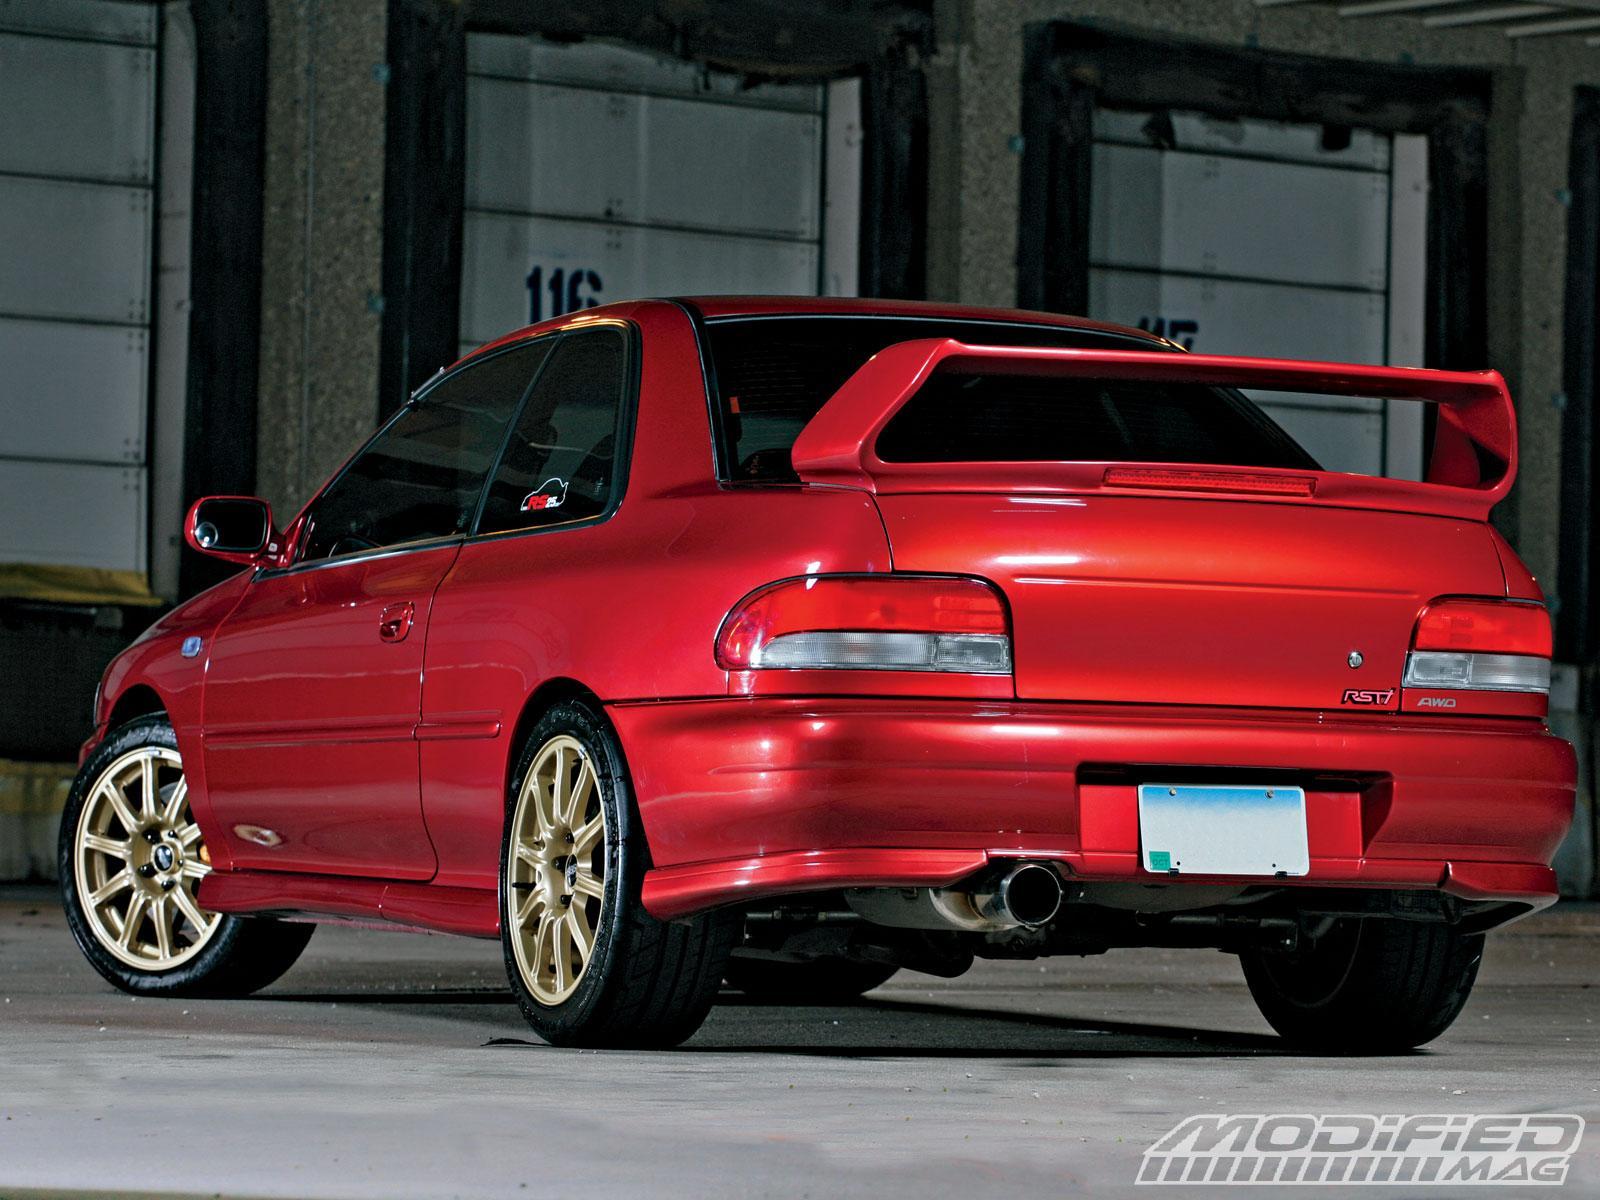 2000 Subaru Impreza Information And Photos Zombiedrive Outback Turbo 800 1024 1280 1600 Origin